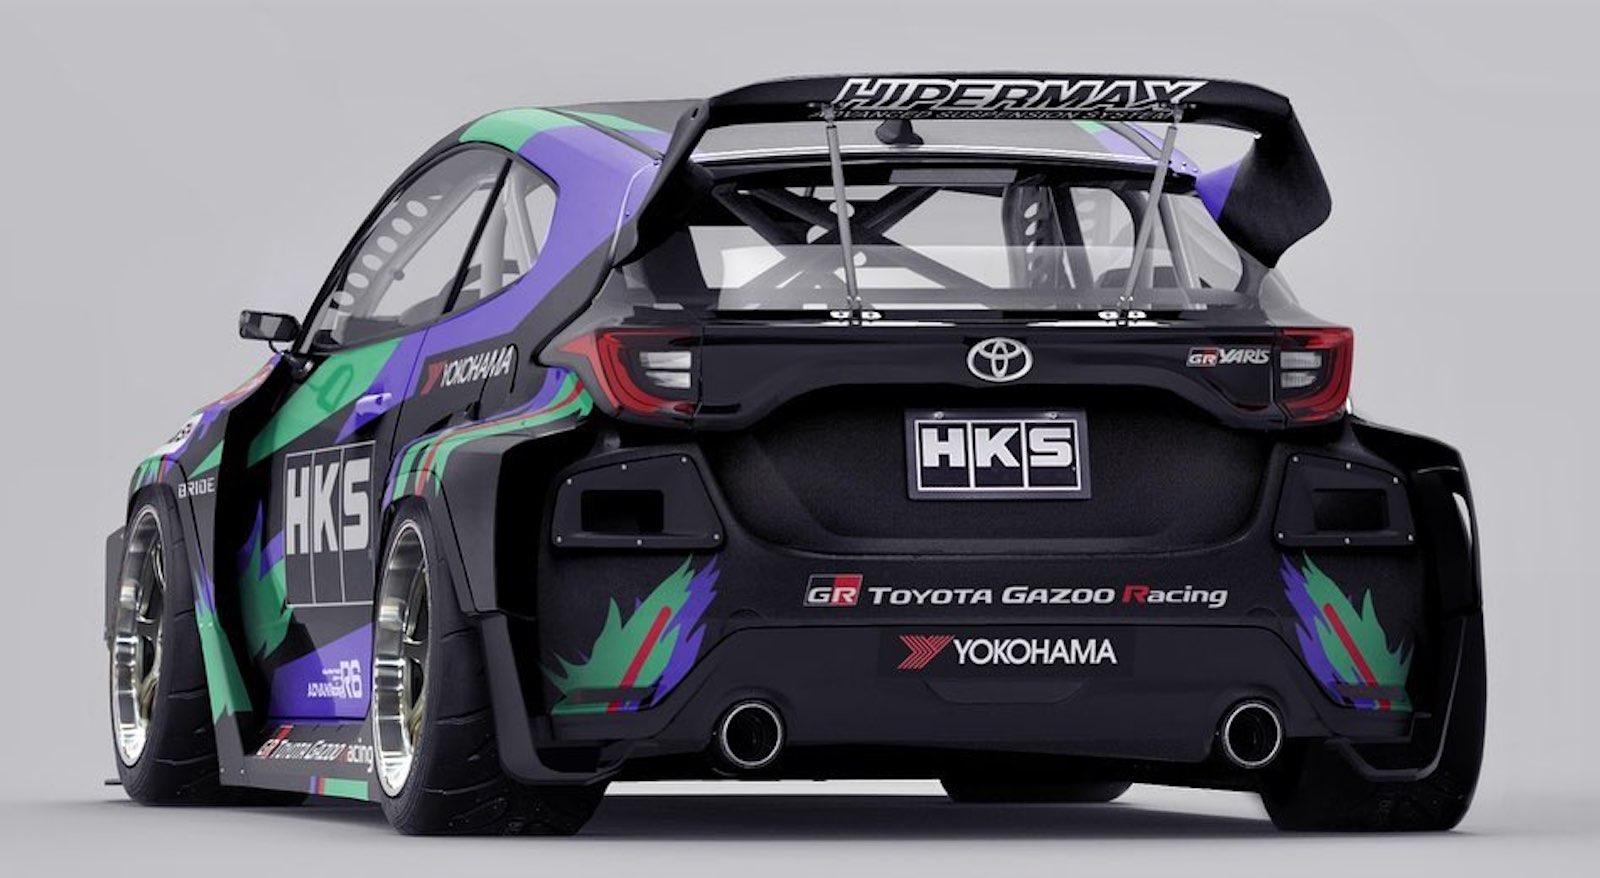 Toyota Gr Yaris Modificaciones 2jz 2